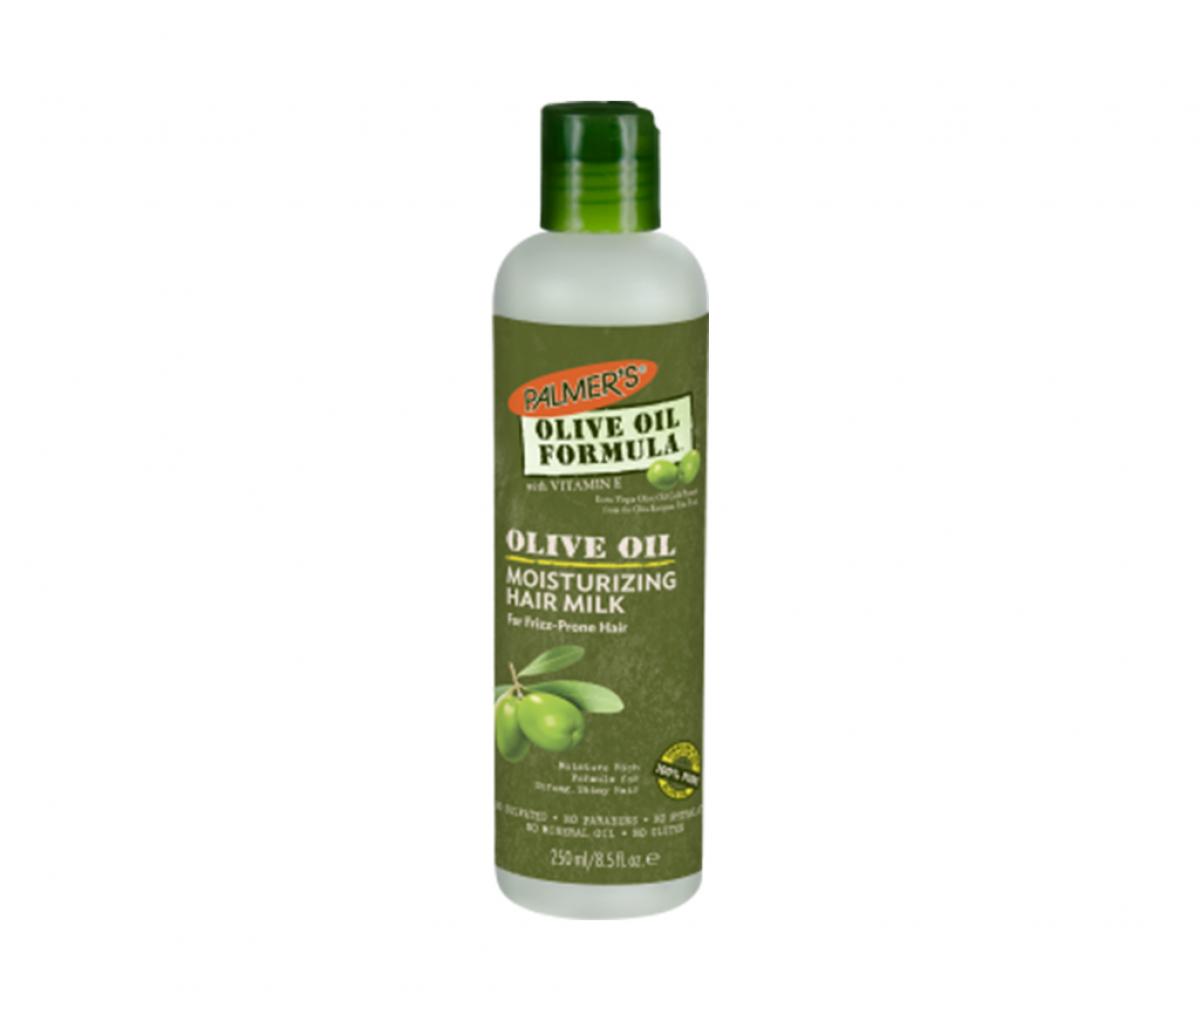 Palmers Olive Oil Formula Hair Milk